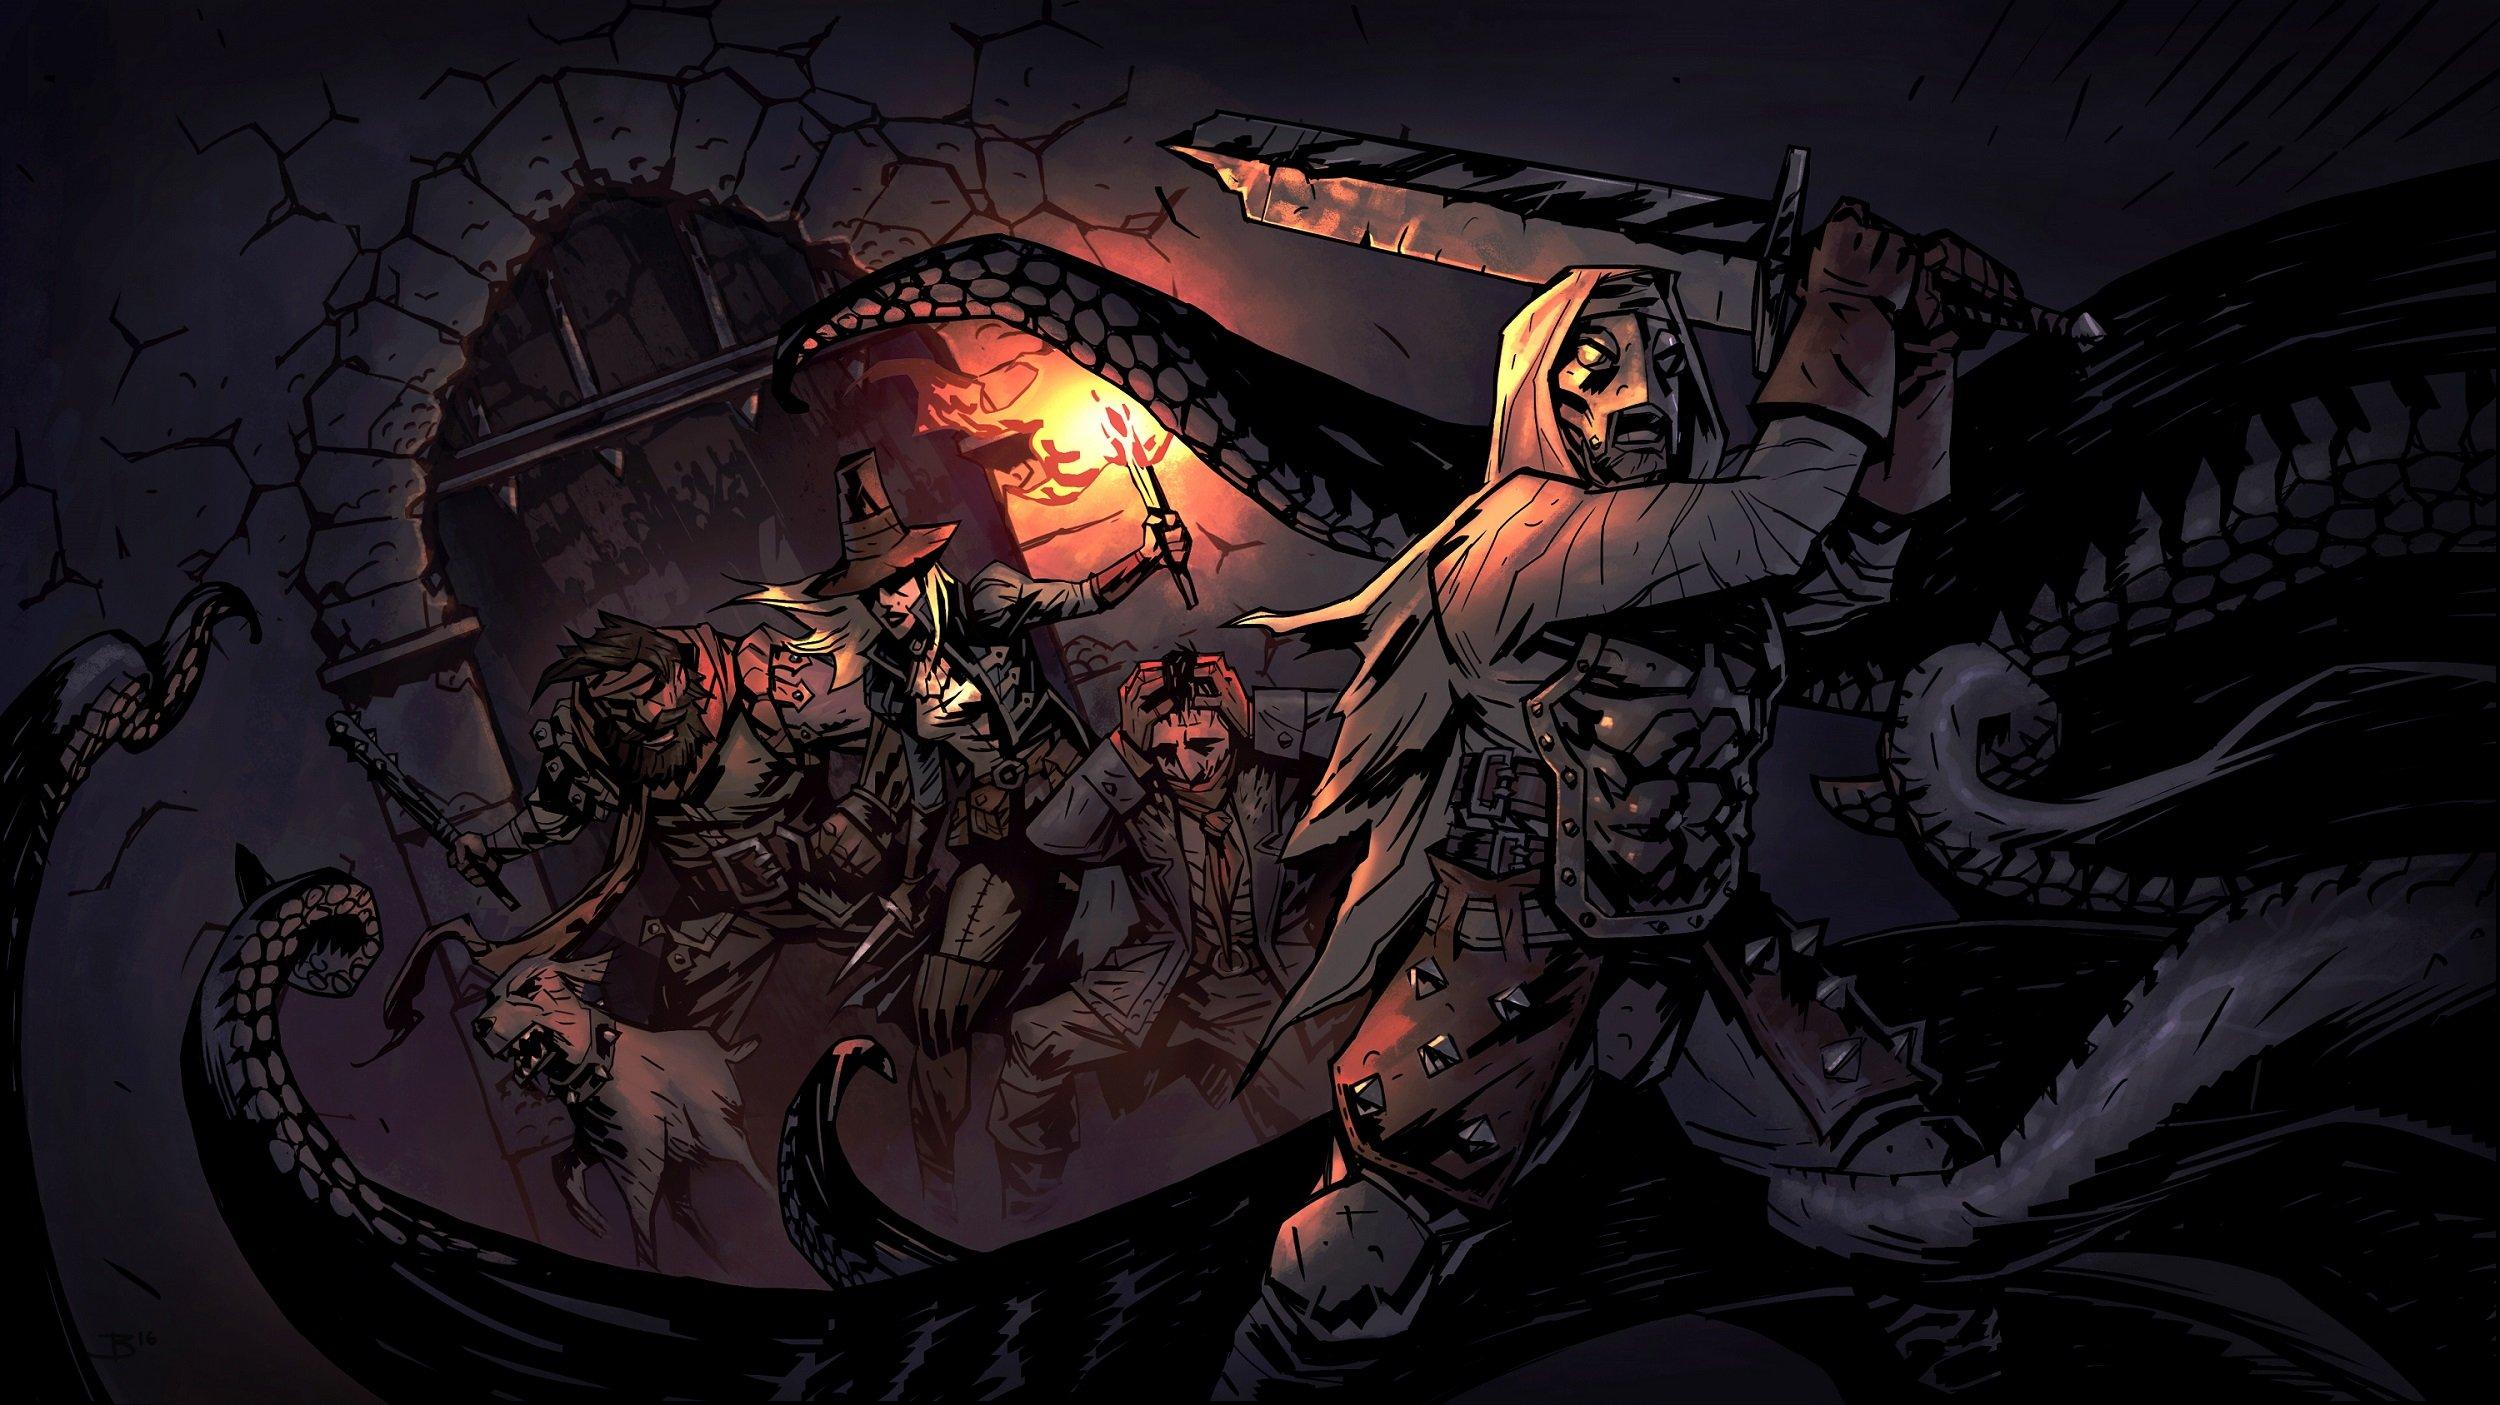 darkest dungeon Chris Bourassa крис бурасса отвратительные мужики disgusting men